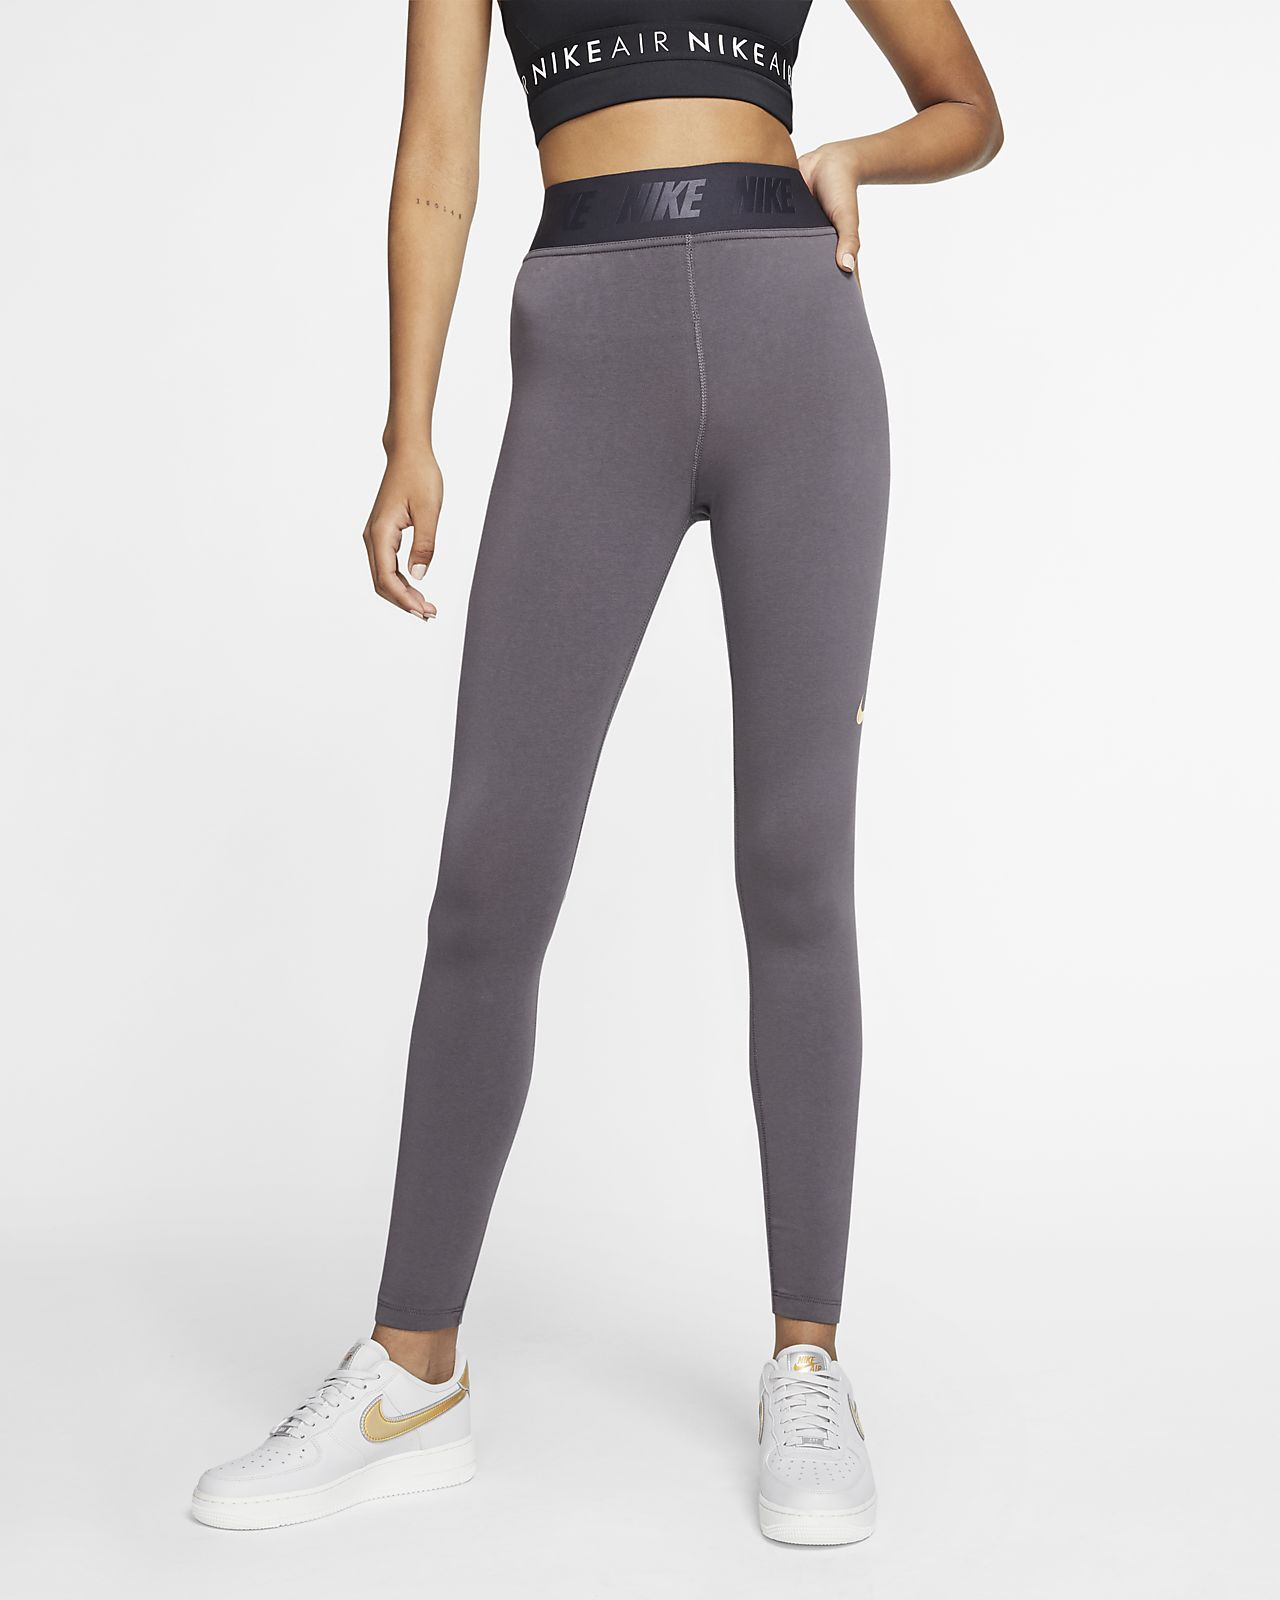 Leggings de tiro alto para mujer Nike Sportswear Leg-A-See Maria Sharapova x la Cortez